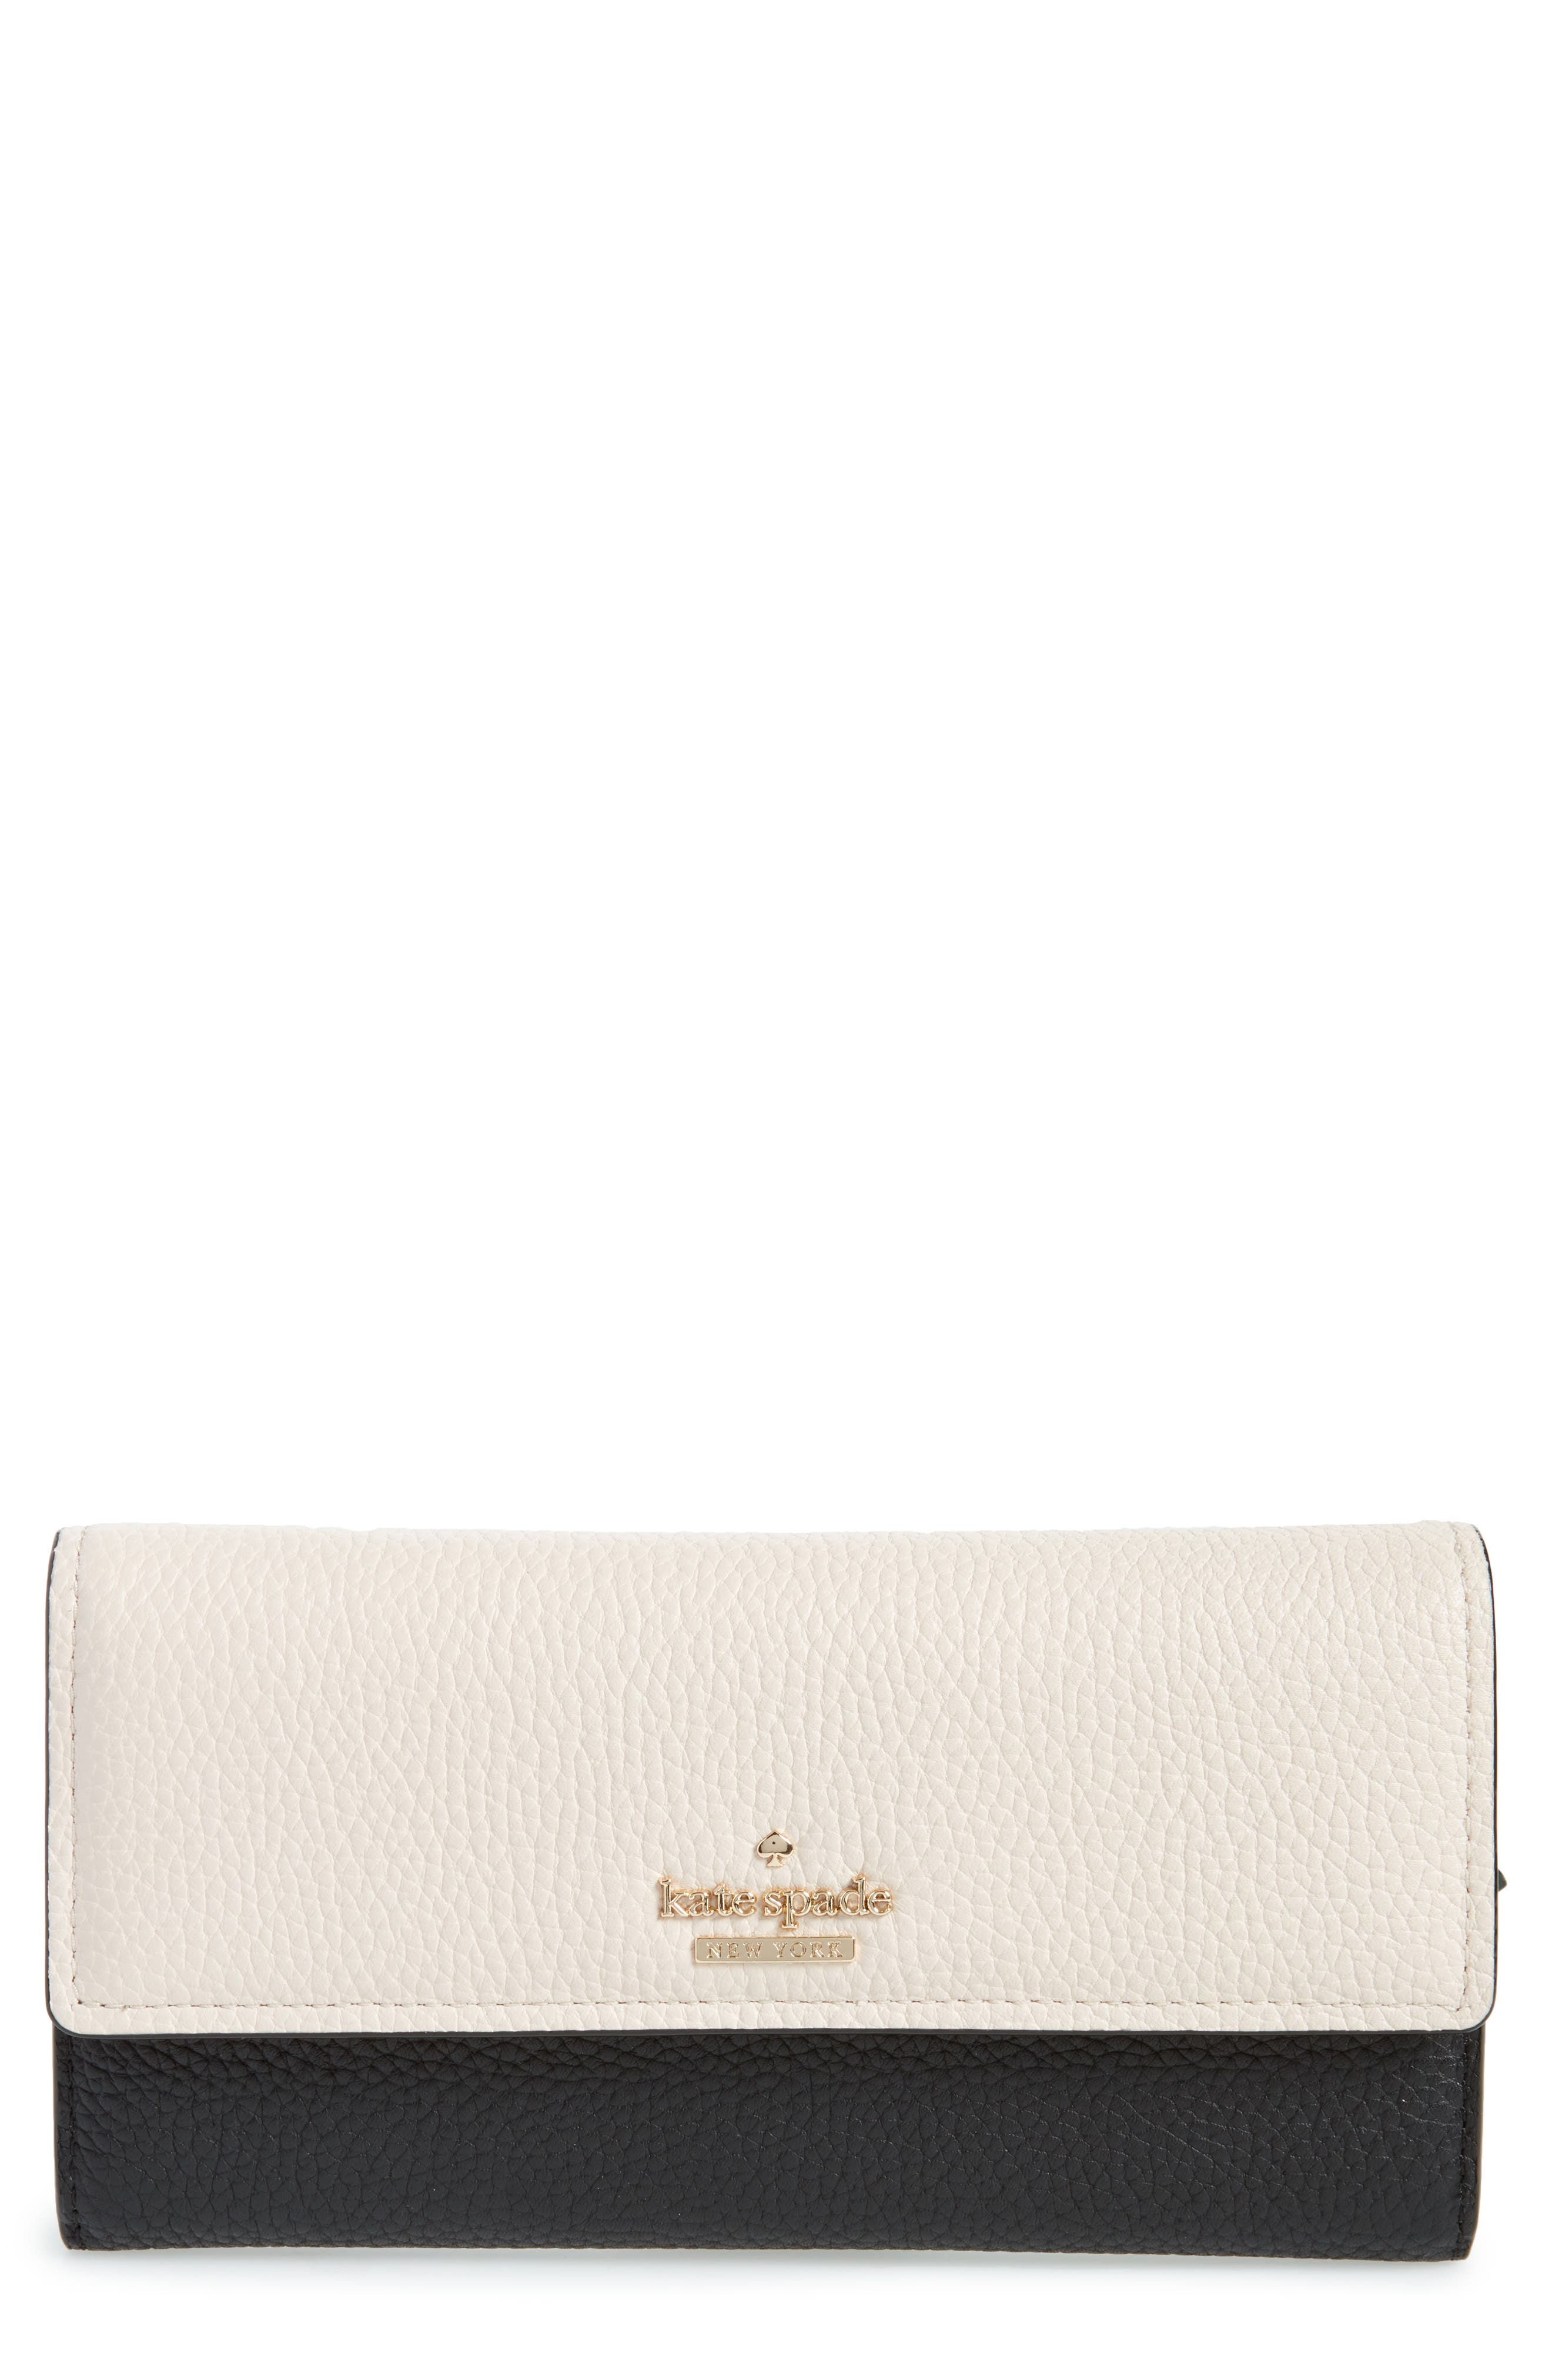 jackson street - kinsley leather wallet,                         Main,                         color, Black/ Bleach Bone